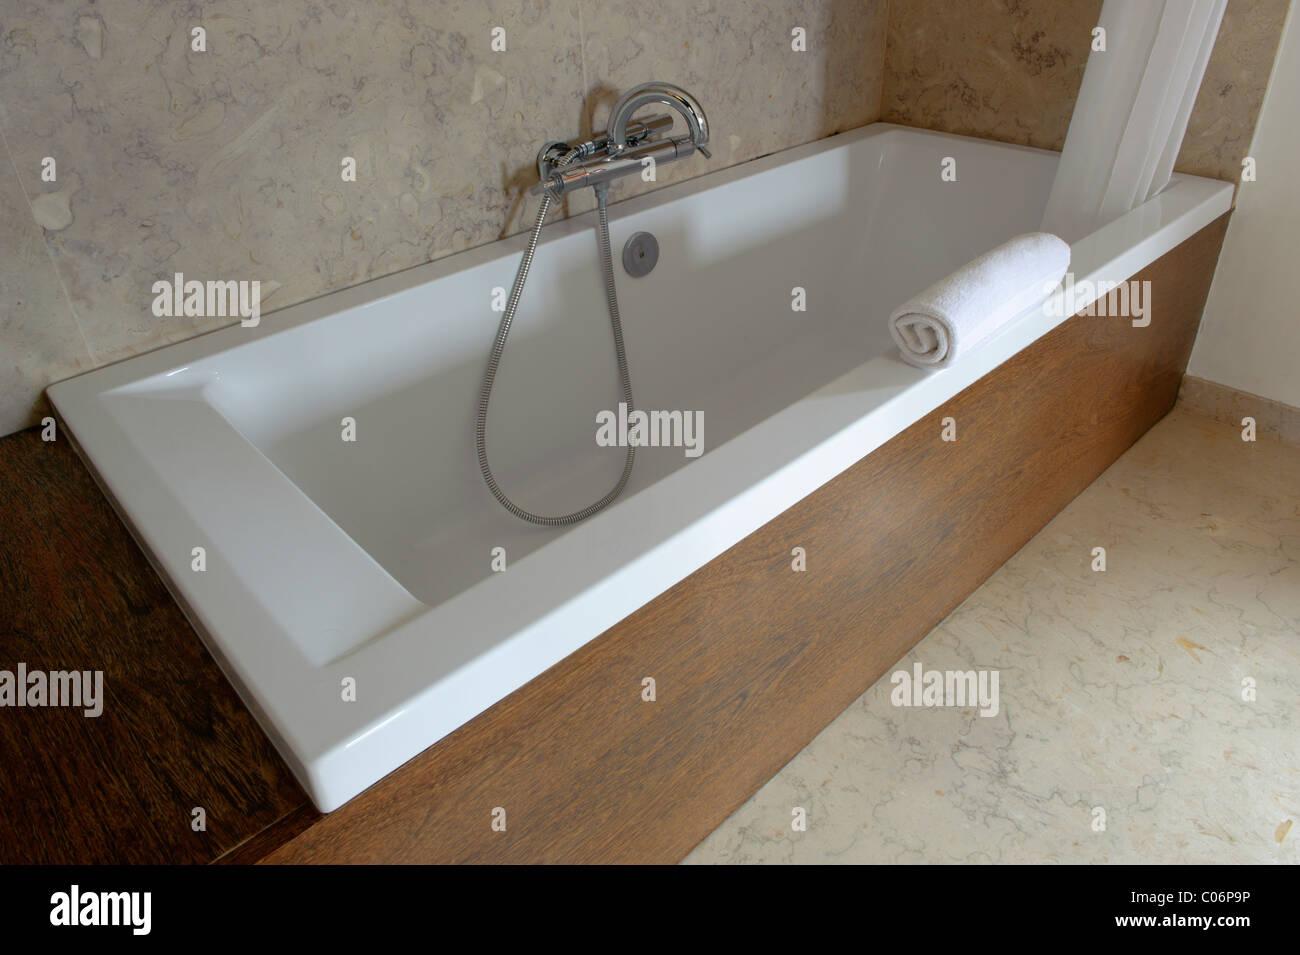 Modern contemporary bath tub - Stock Image